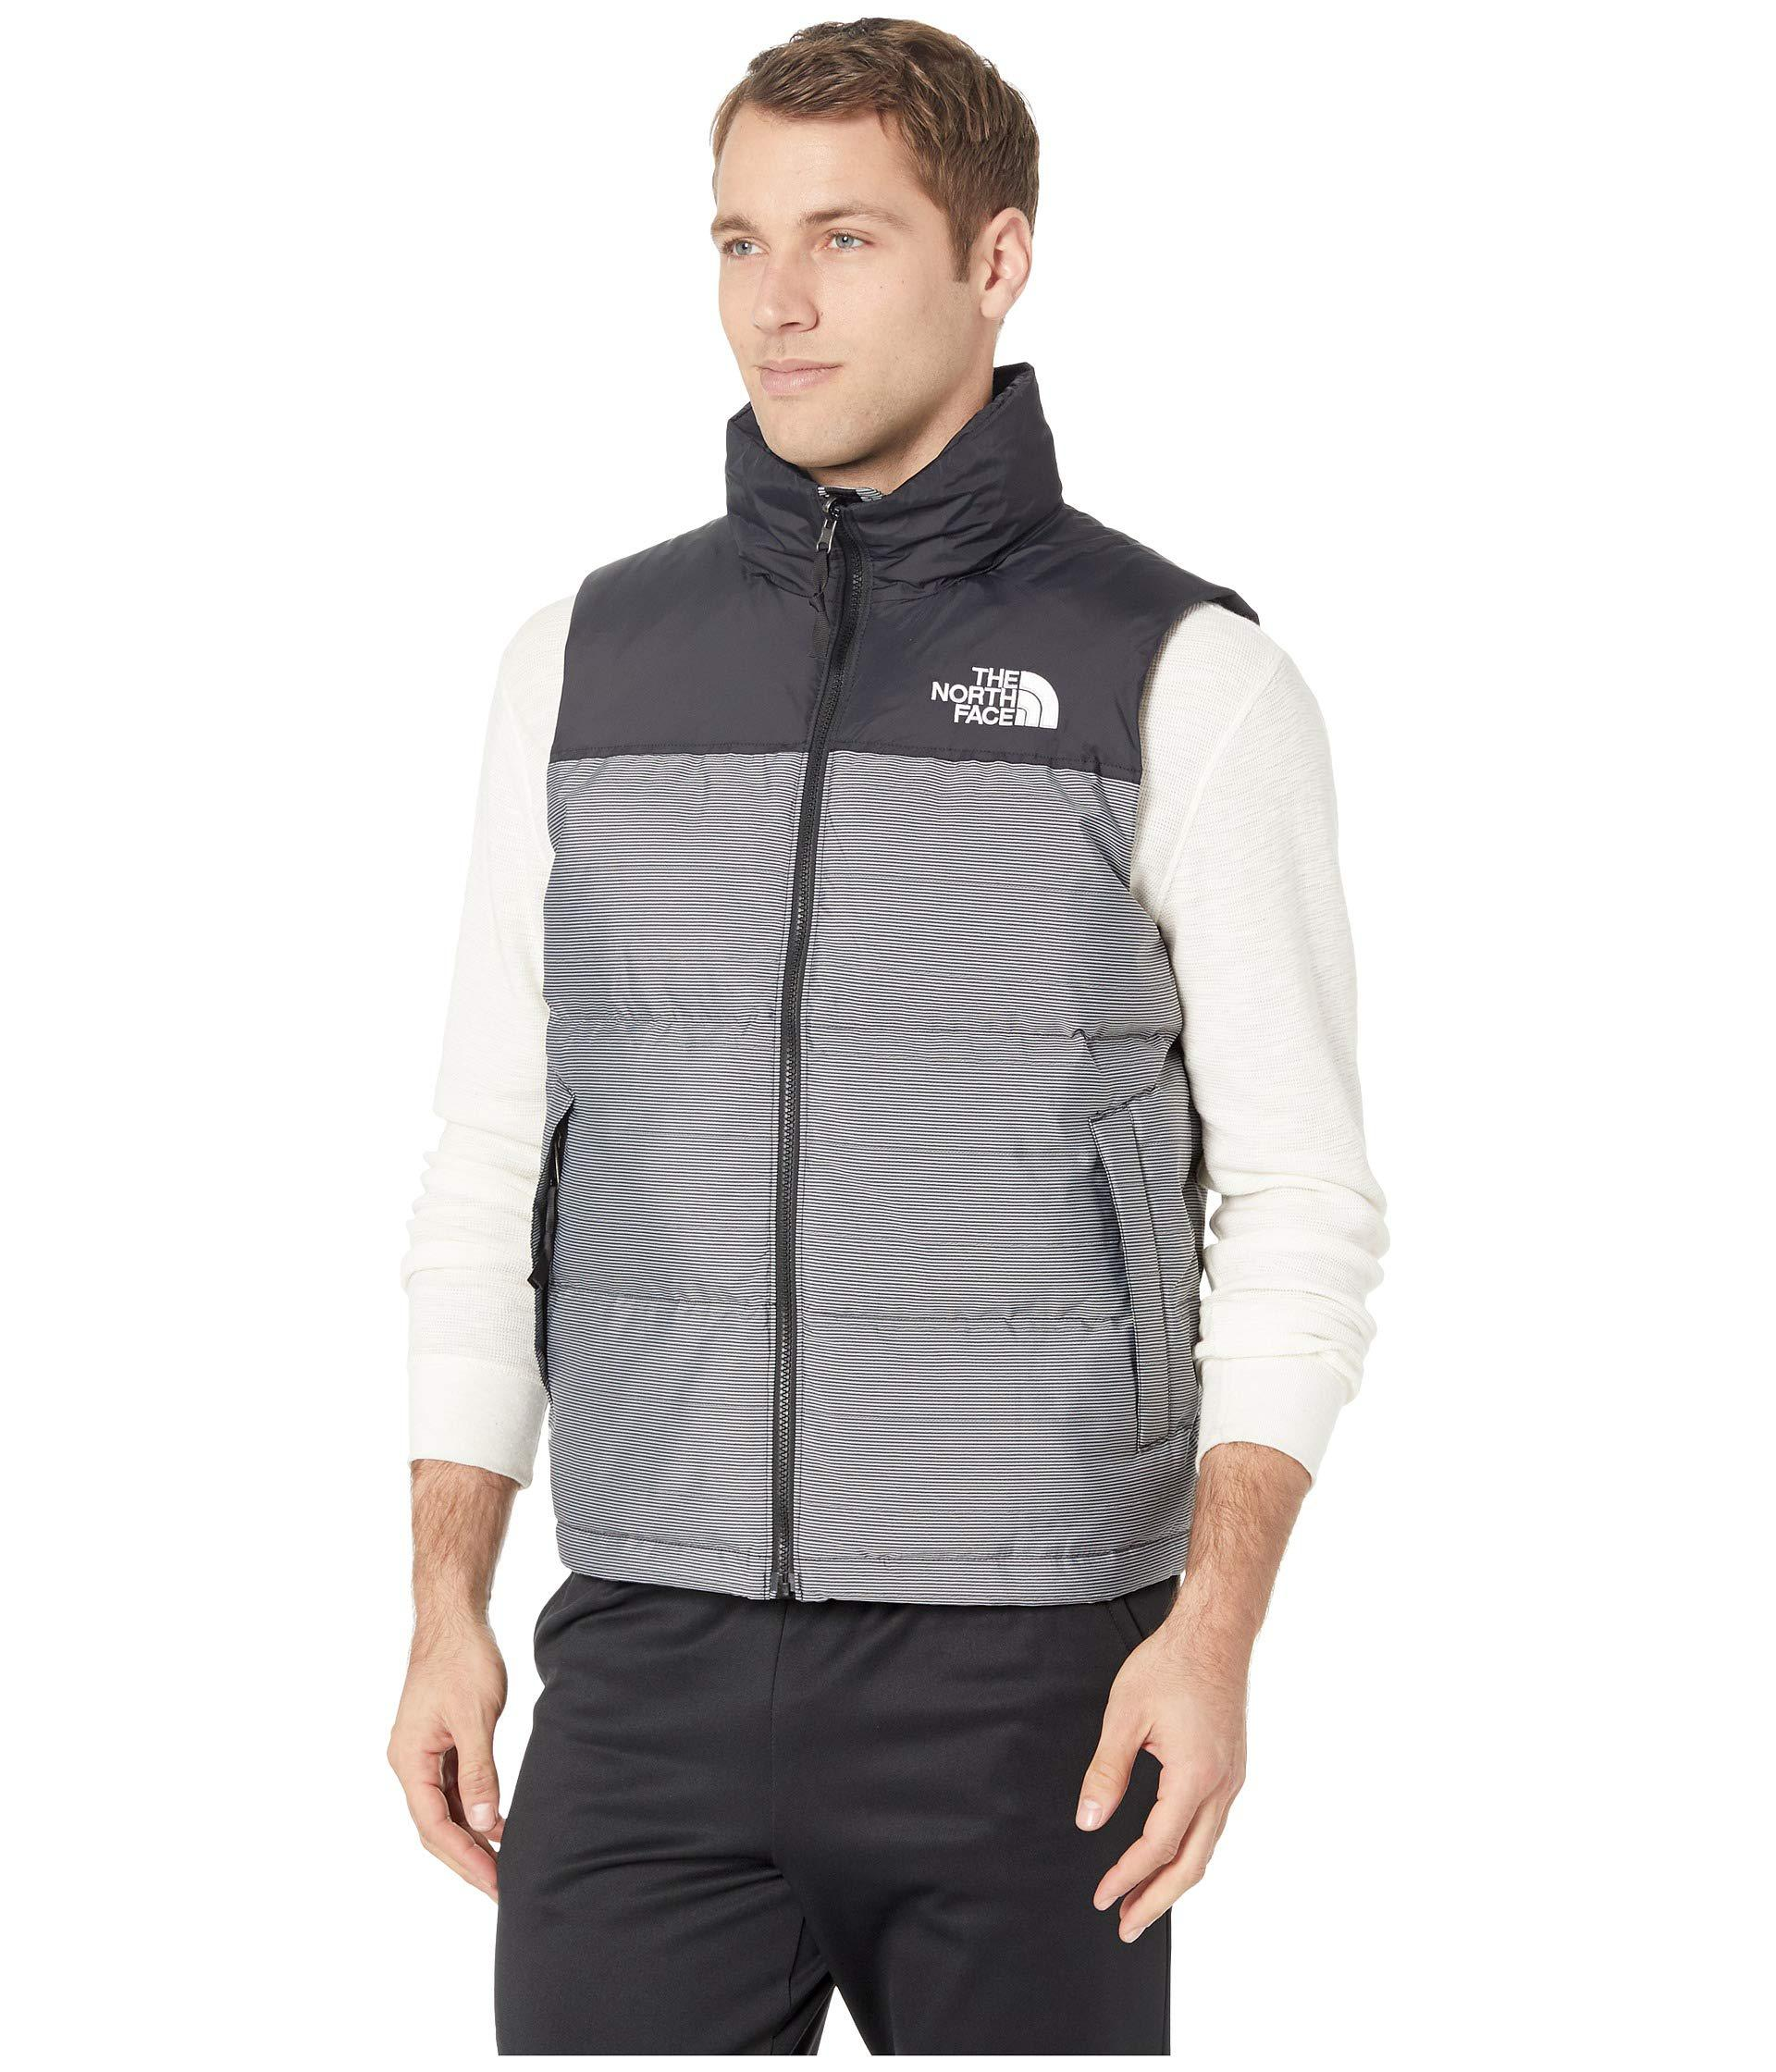 fd34c1583ba7 Lyst - The North Face 1996 Retro Novelty Nuptse Vest (tnf Black Multi  Dobby) Men s Vest in Black for Men